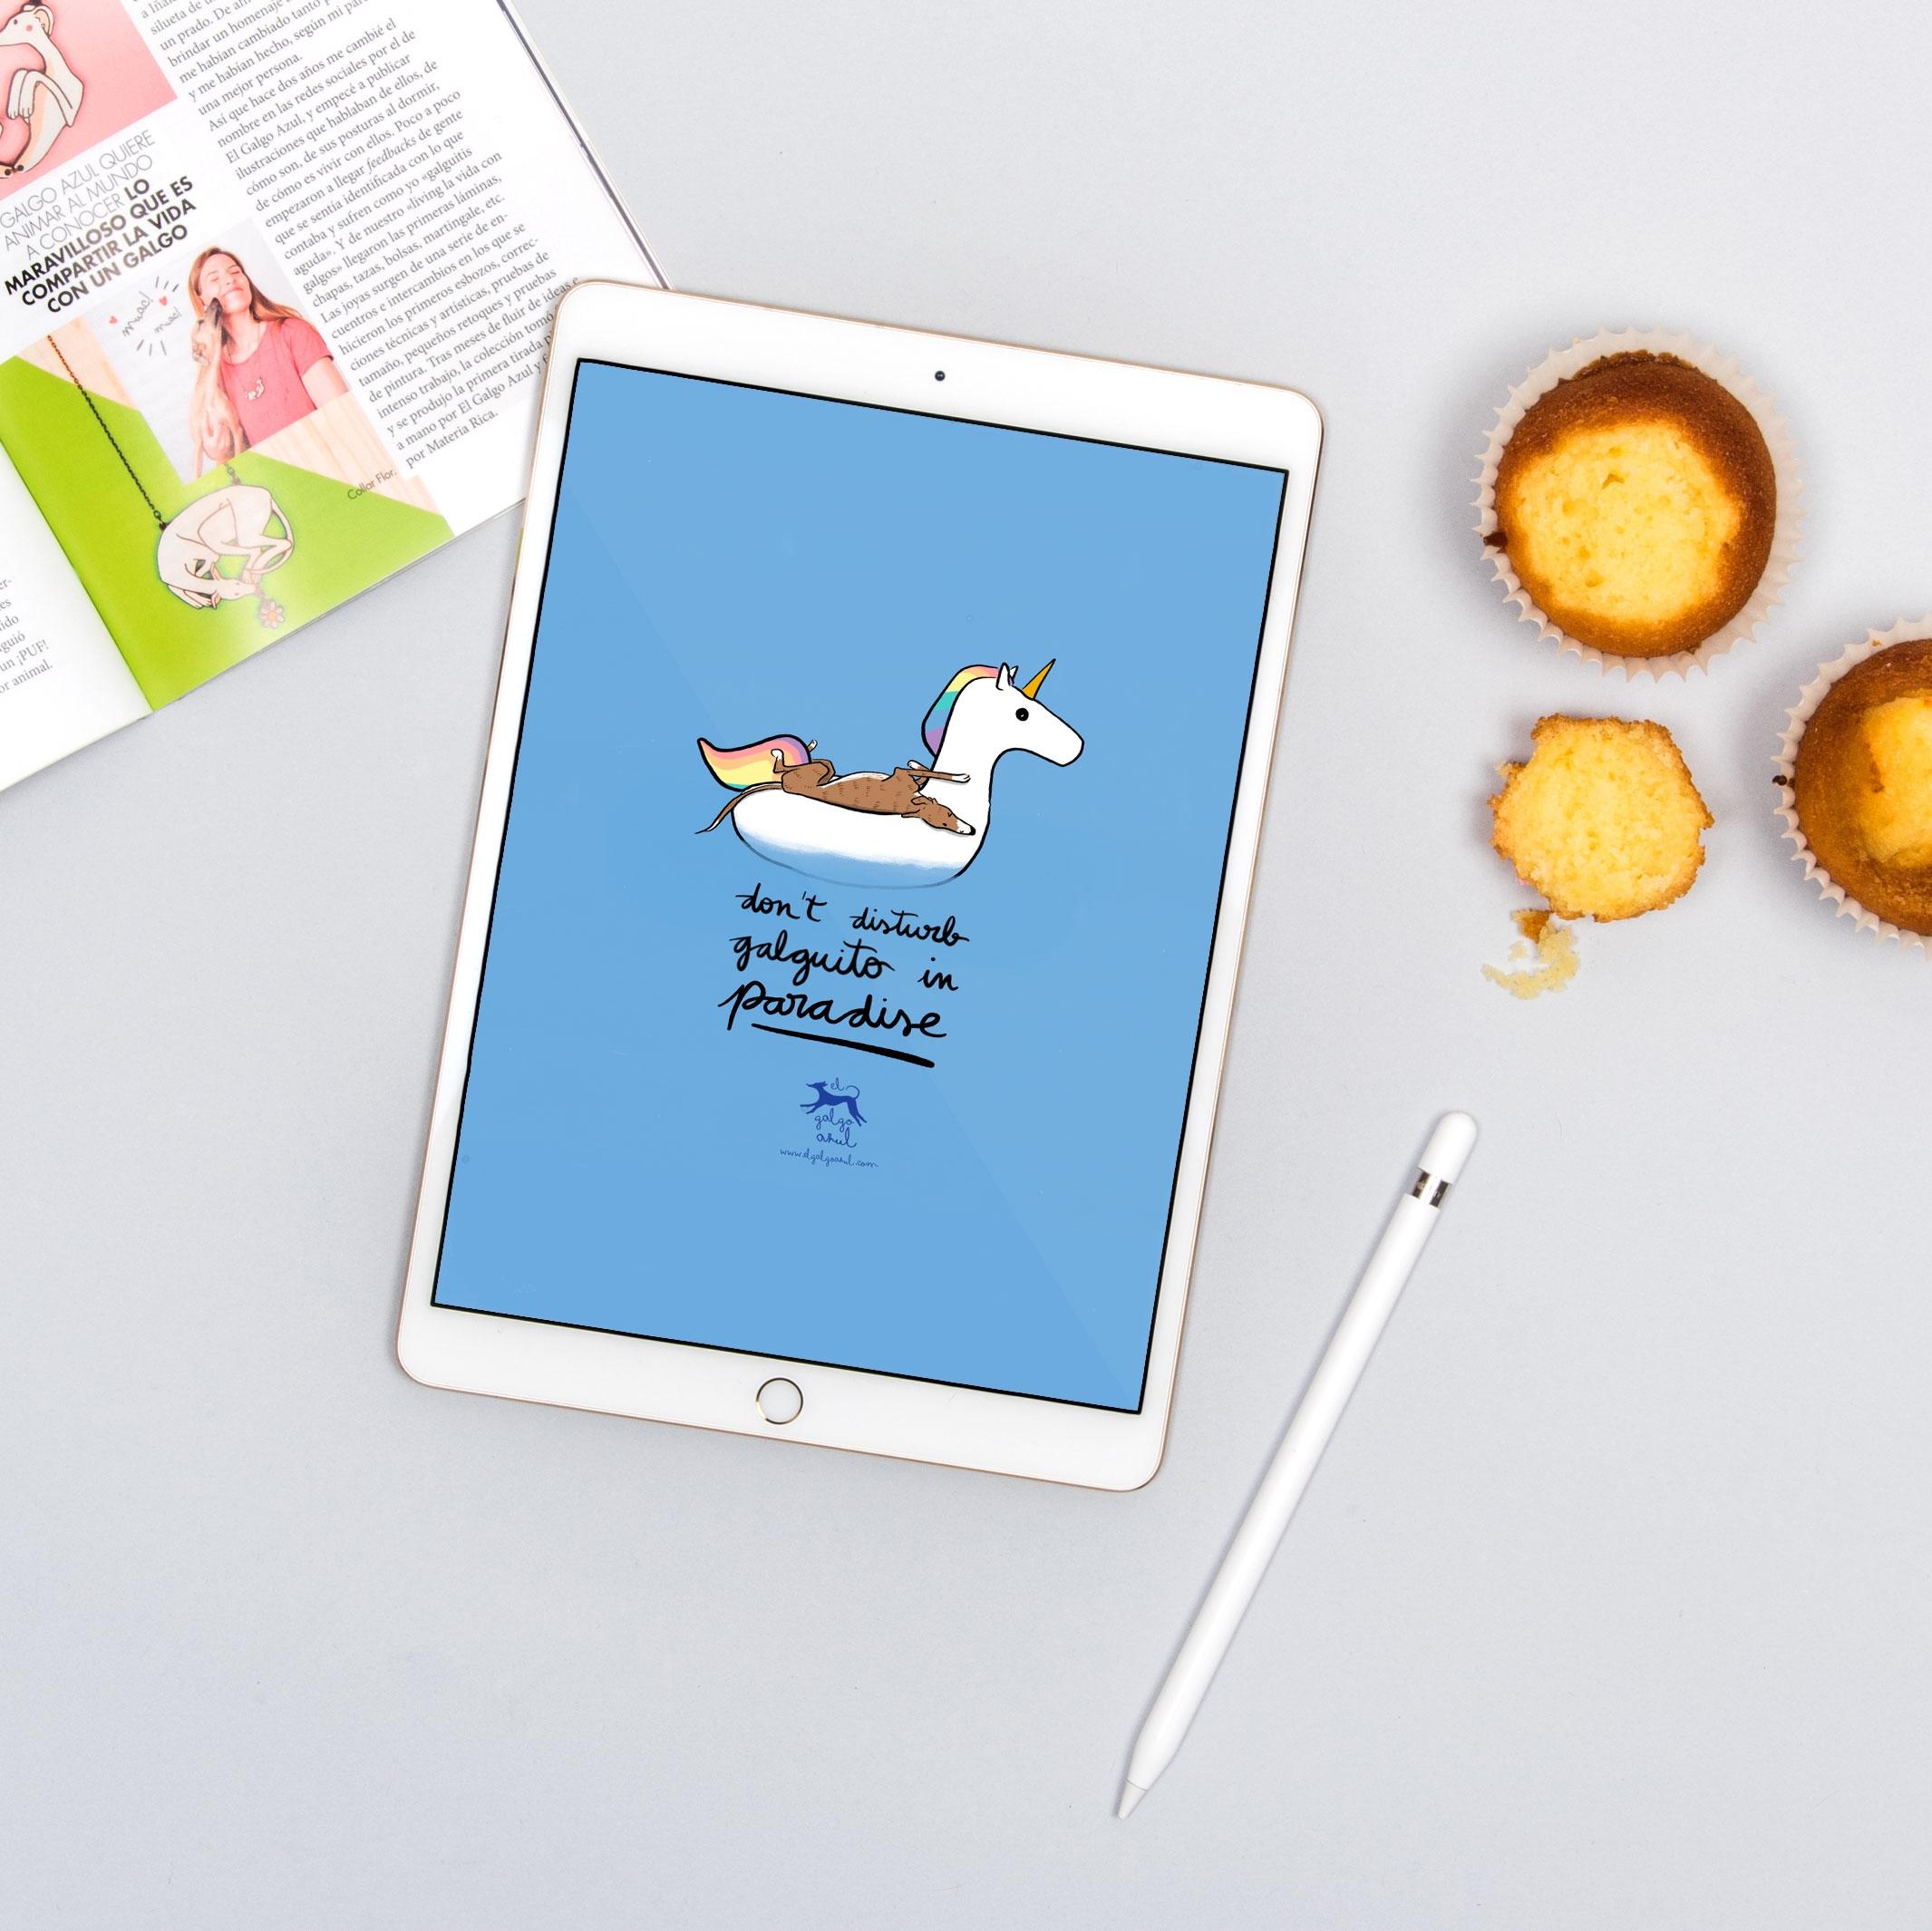 Wallpaper Paradise Tablet